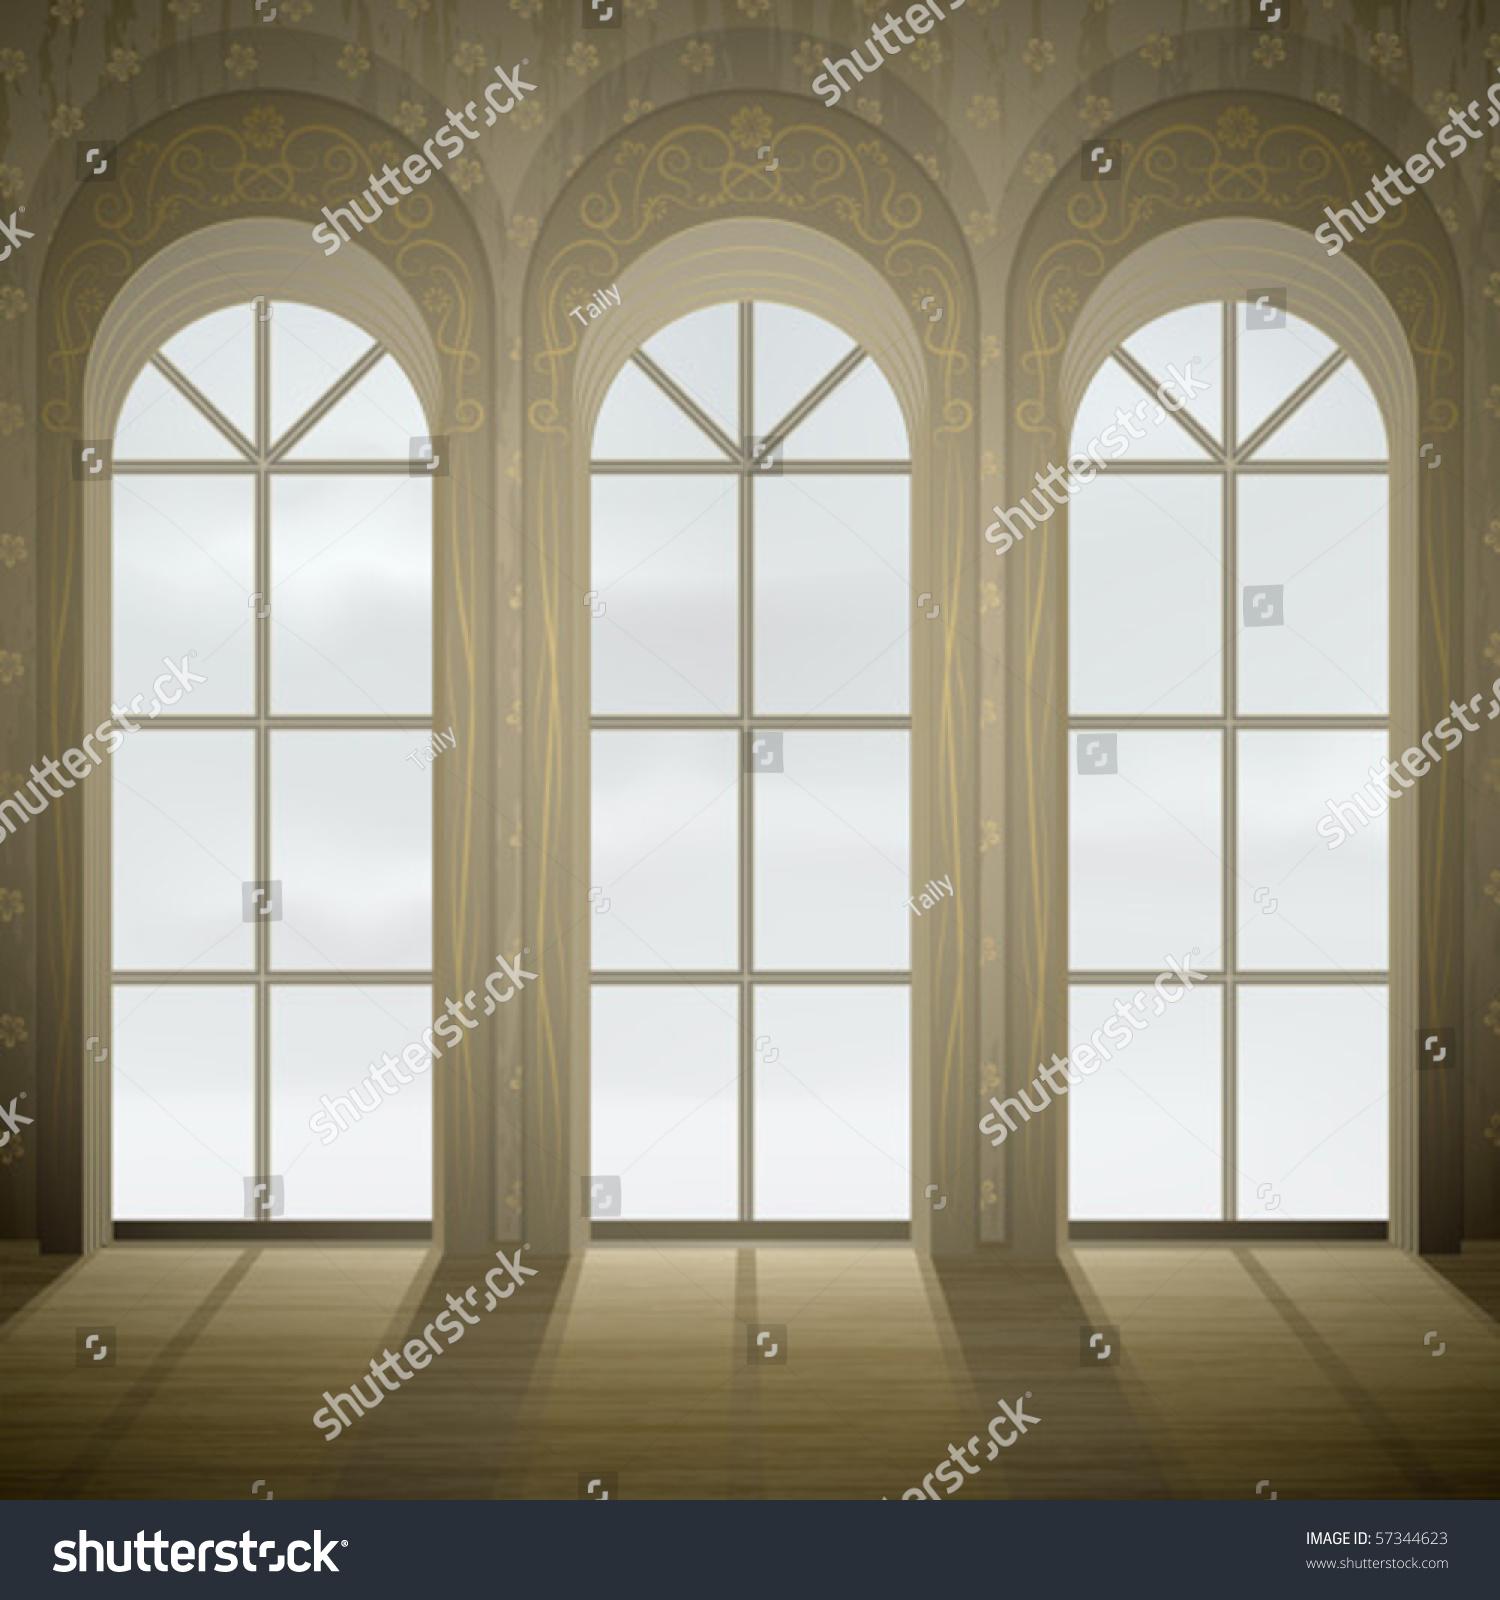 Wall Three Tall Gothic Glass Windows Stock Vector 57344623